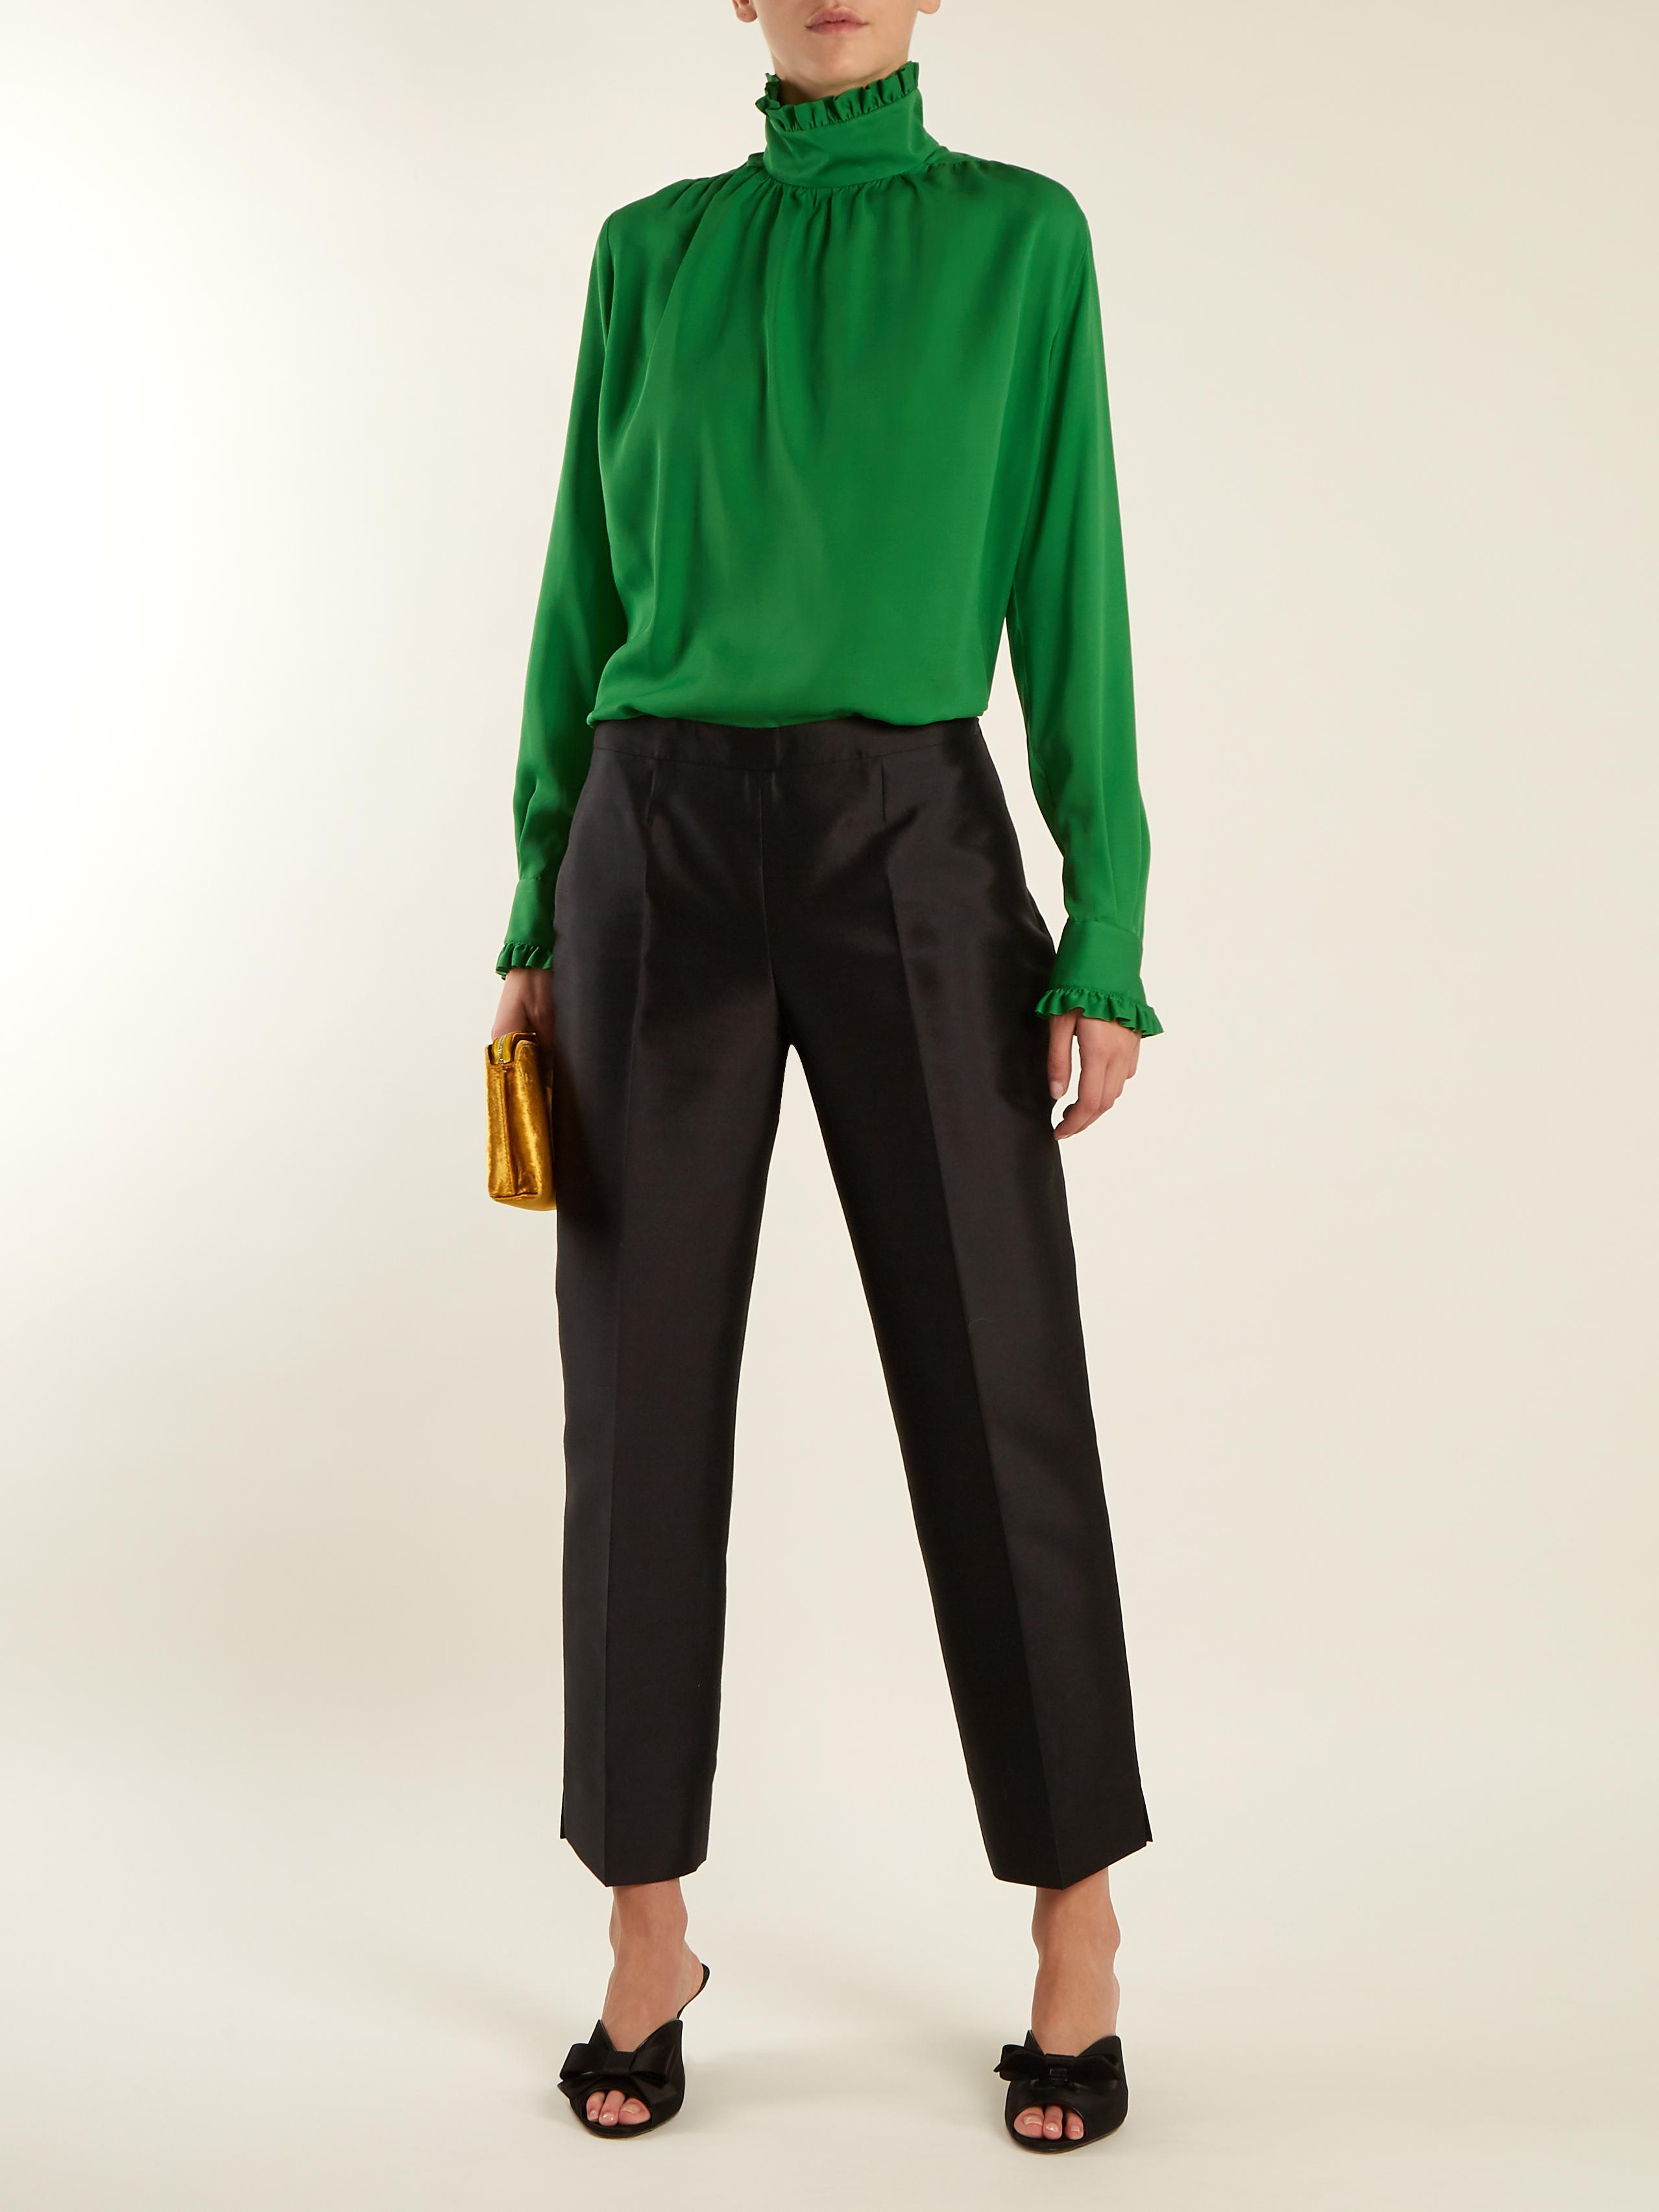 0d495adbbaf4a6 Gucci Ruffle-trimmed High-neck Silk Blouse in Green - Lyst